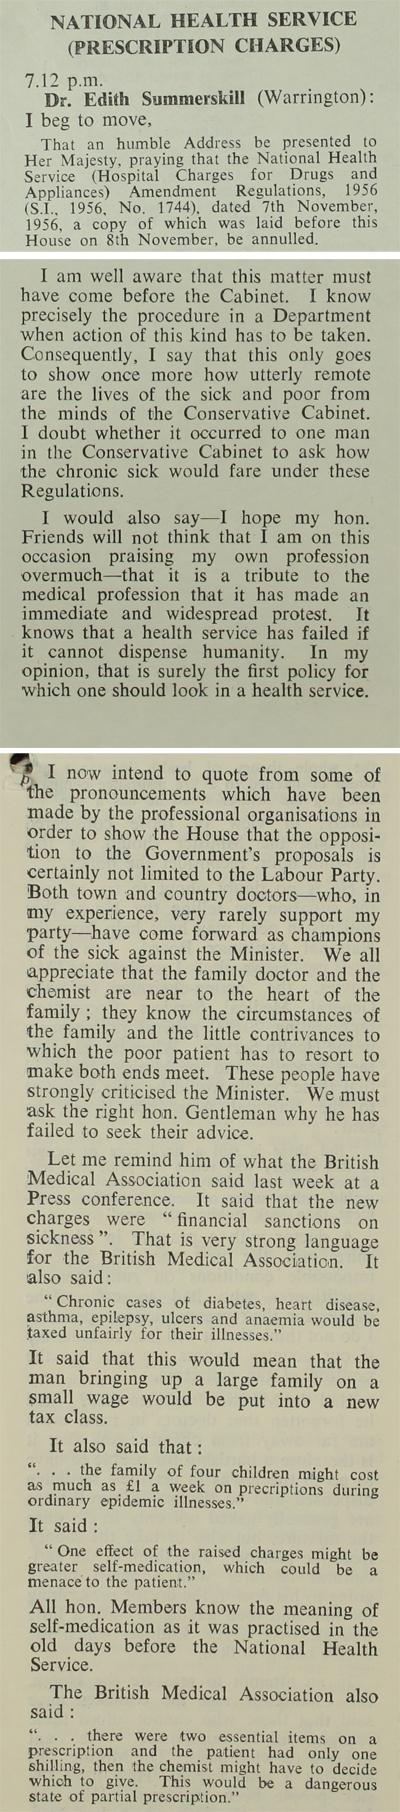 Extract from Hansard, 29th November 1956 (PREM 11/1493)